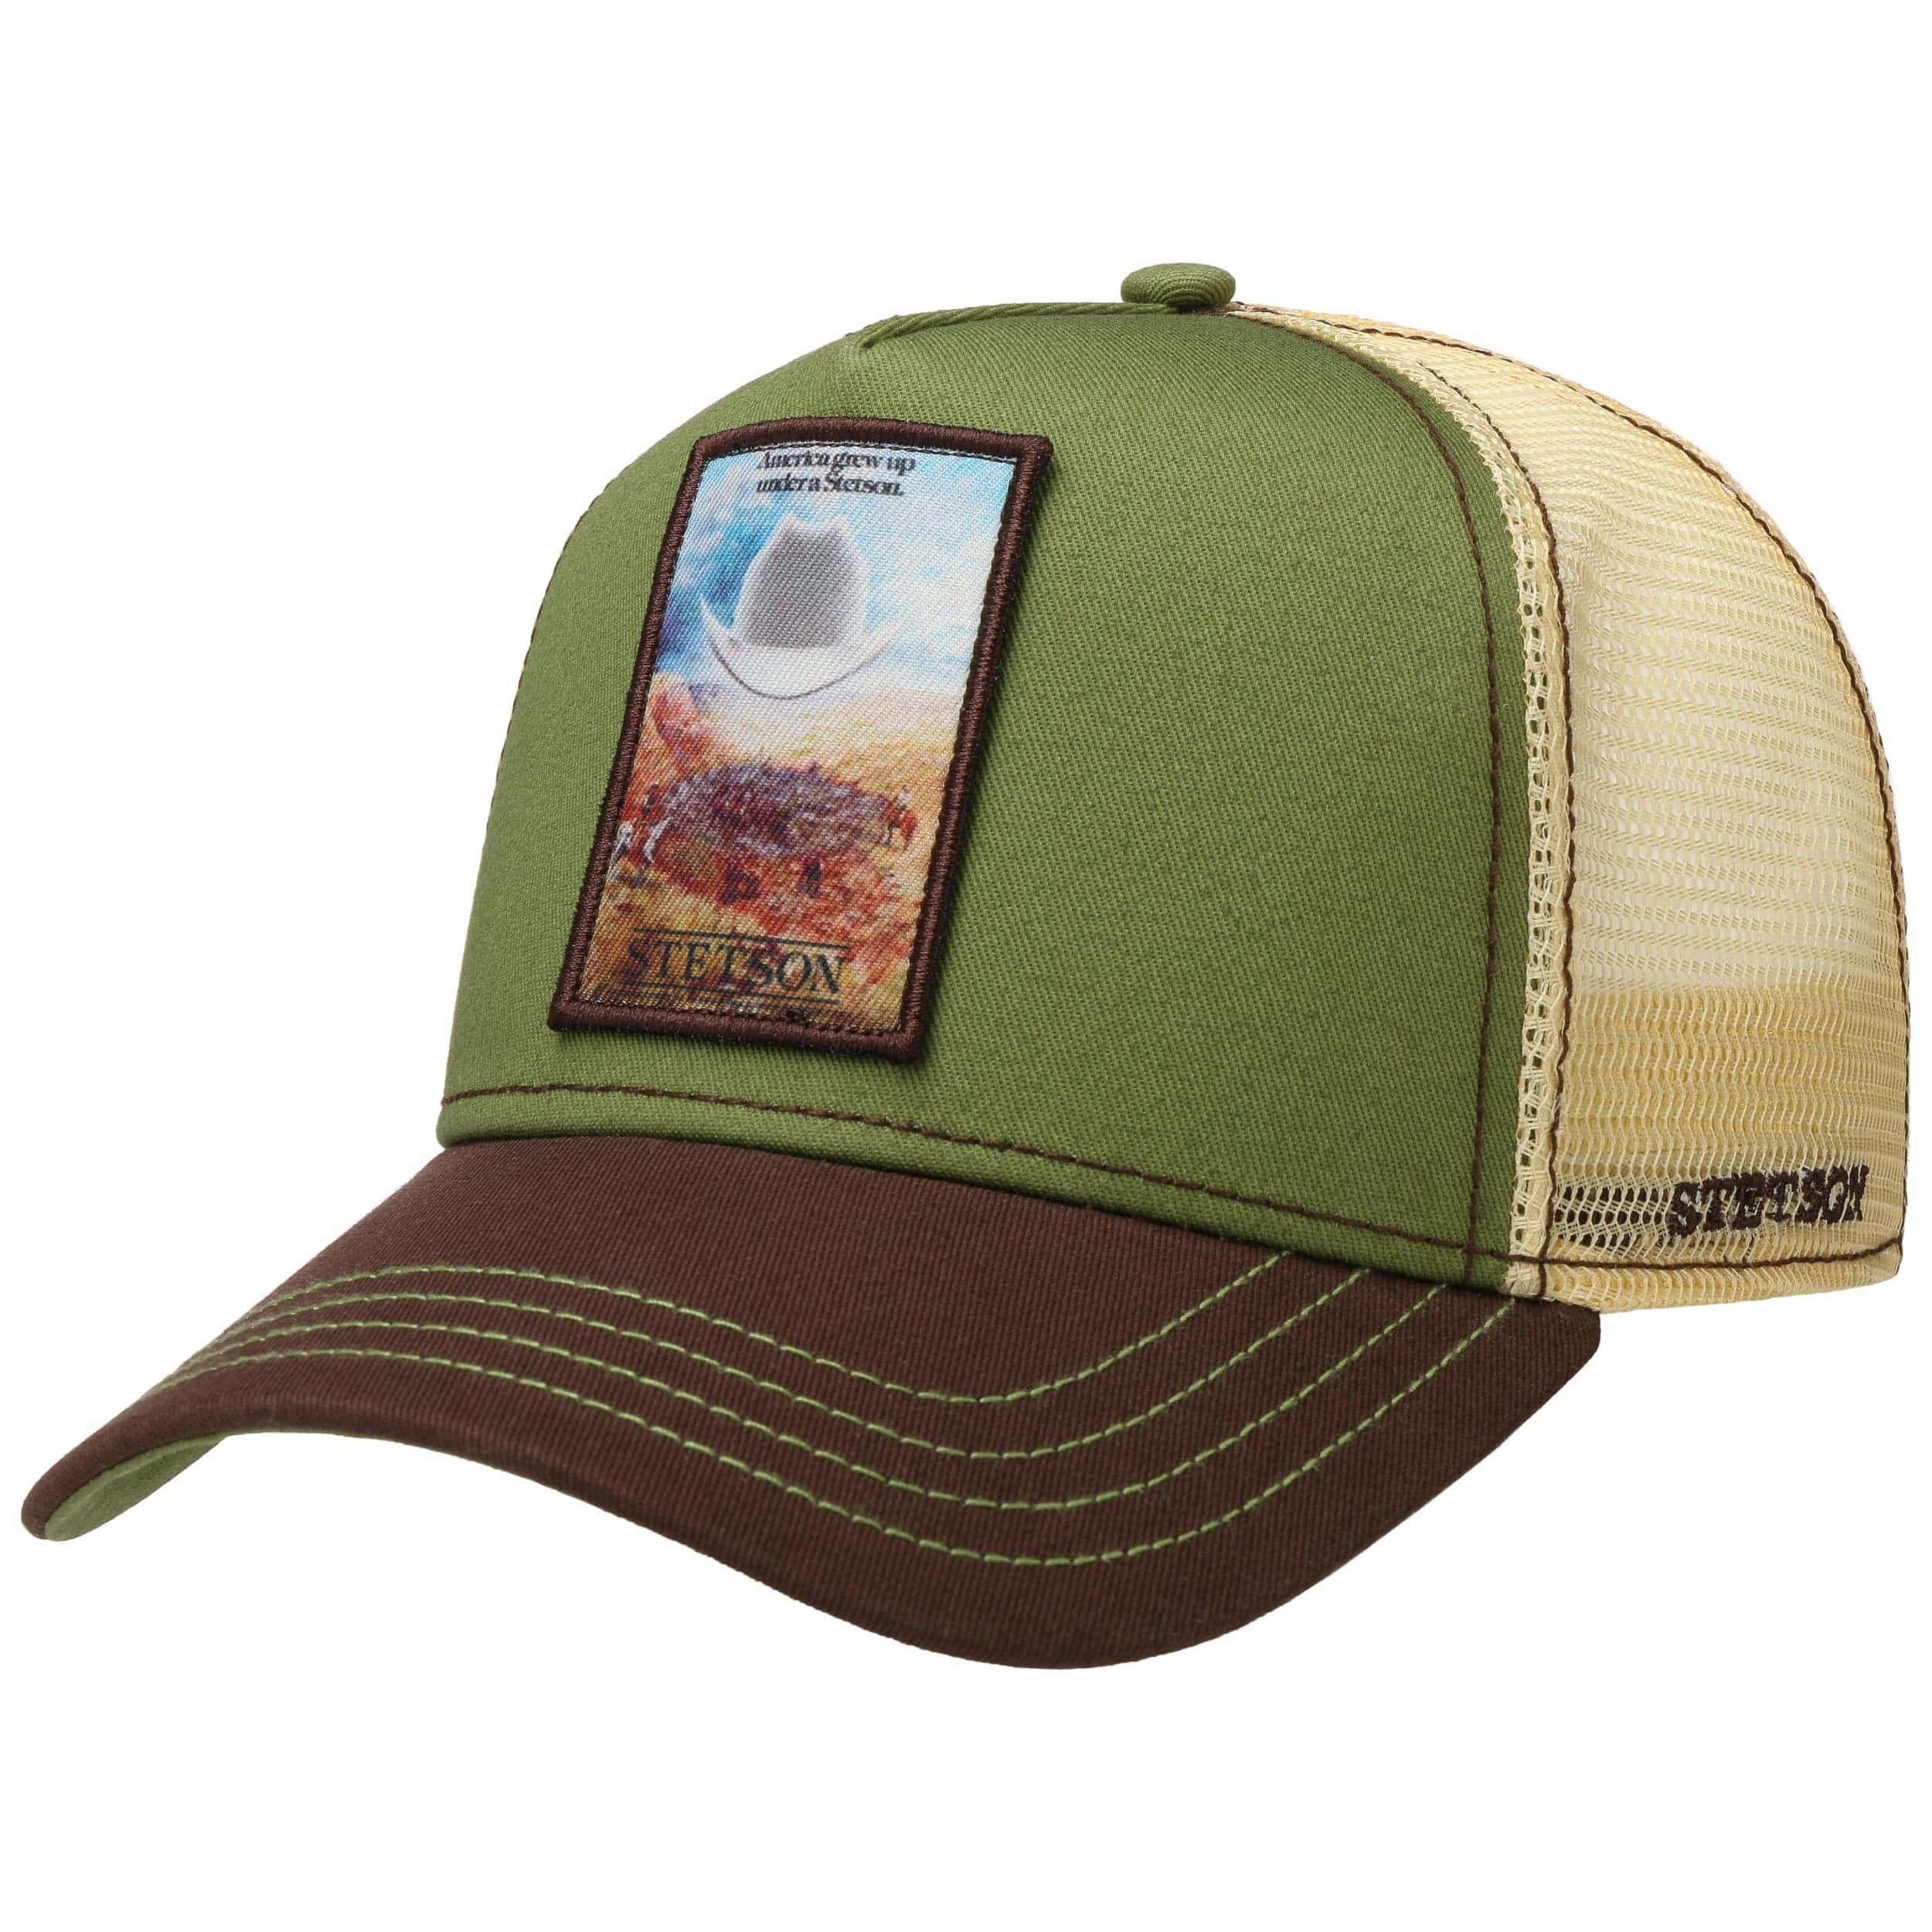 Sajfirlug Texas Strong Fashion Adjustable Cowboy Cap Denim Hat for Women and Men